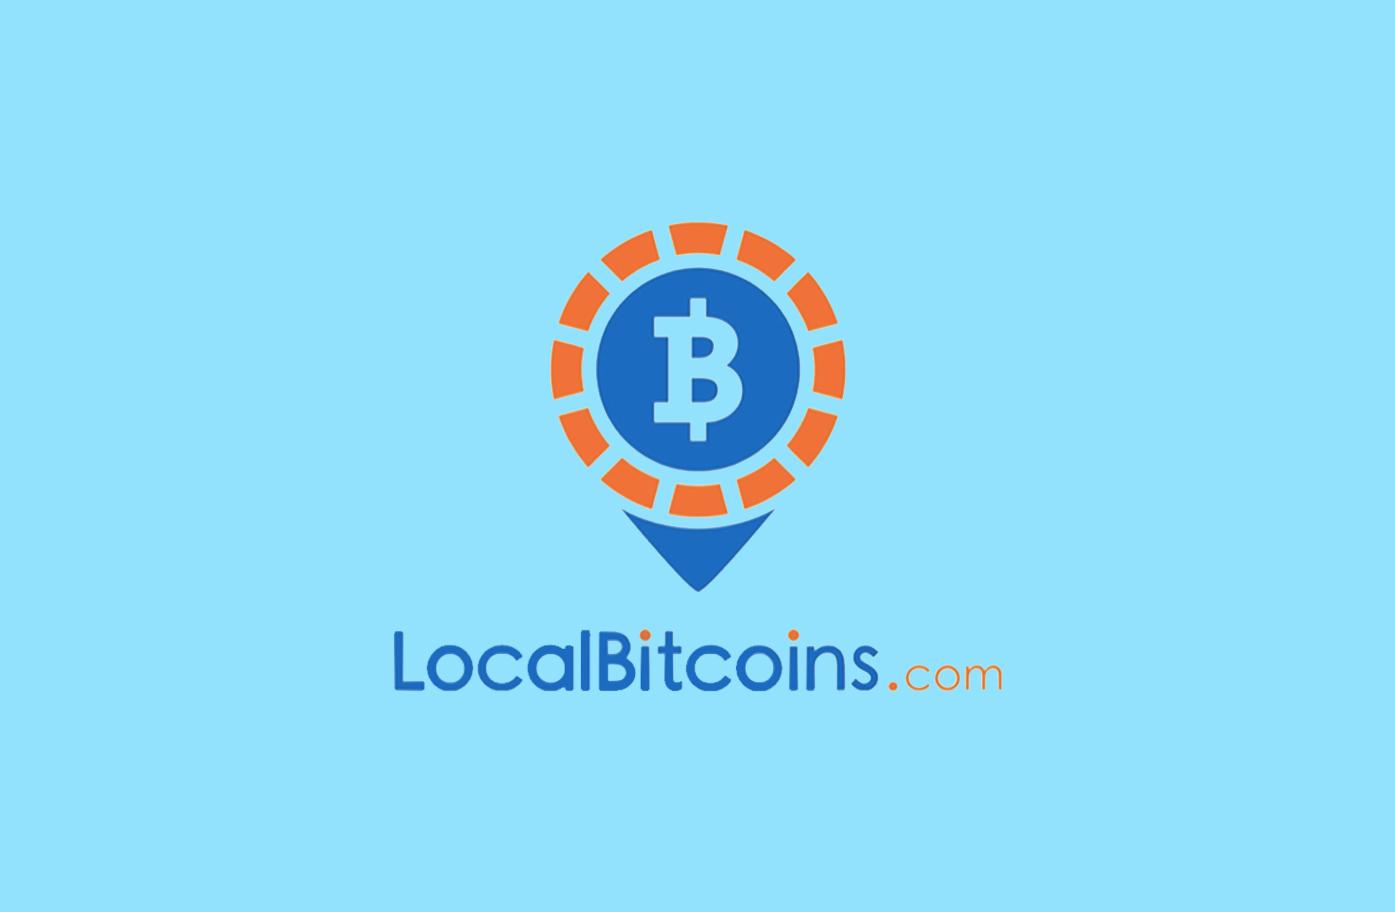 buy Bitcoin on LocalBitcoins